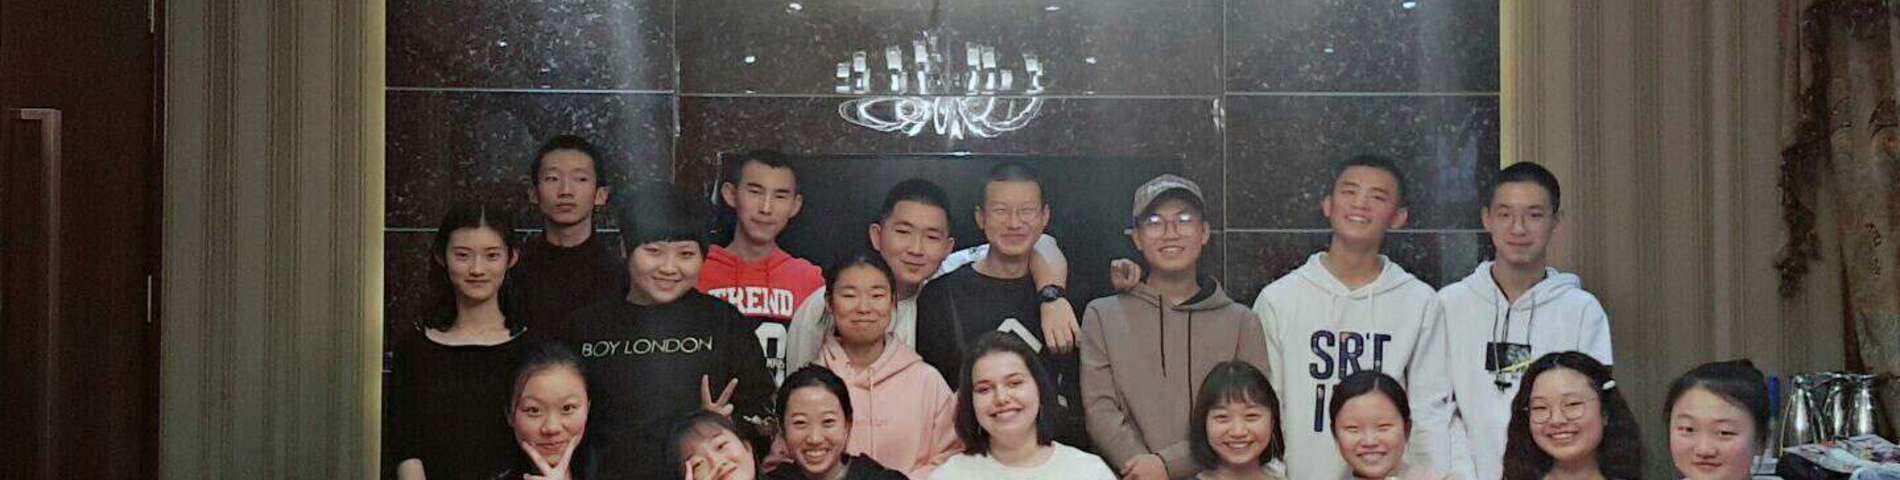 Imagen 1 de la escuela LTL Mandarin School